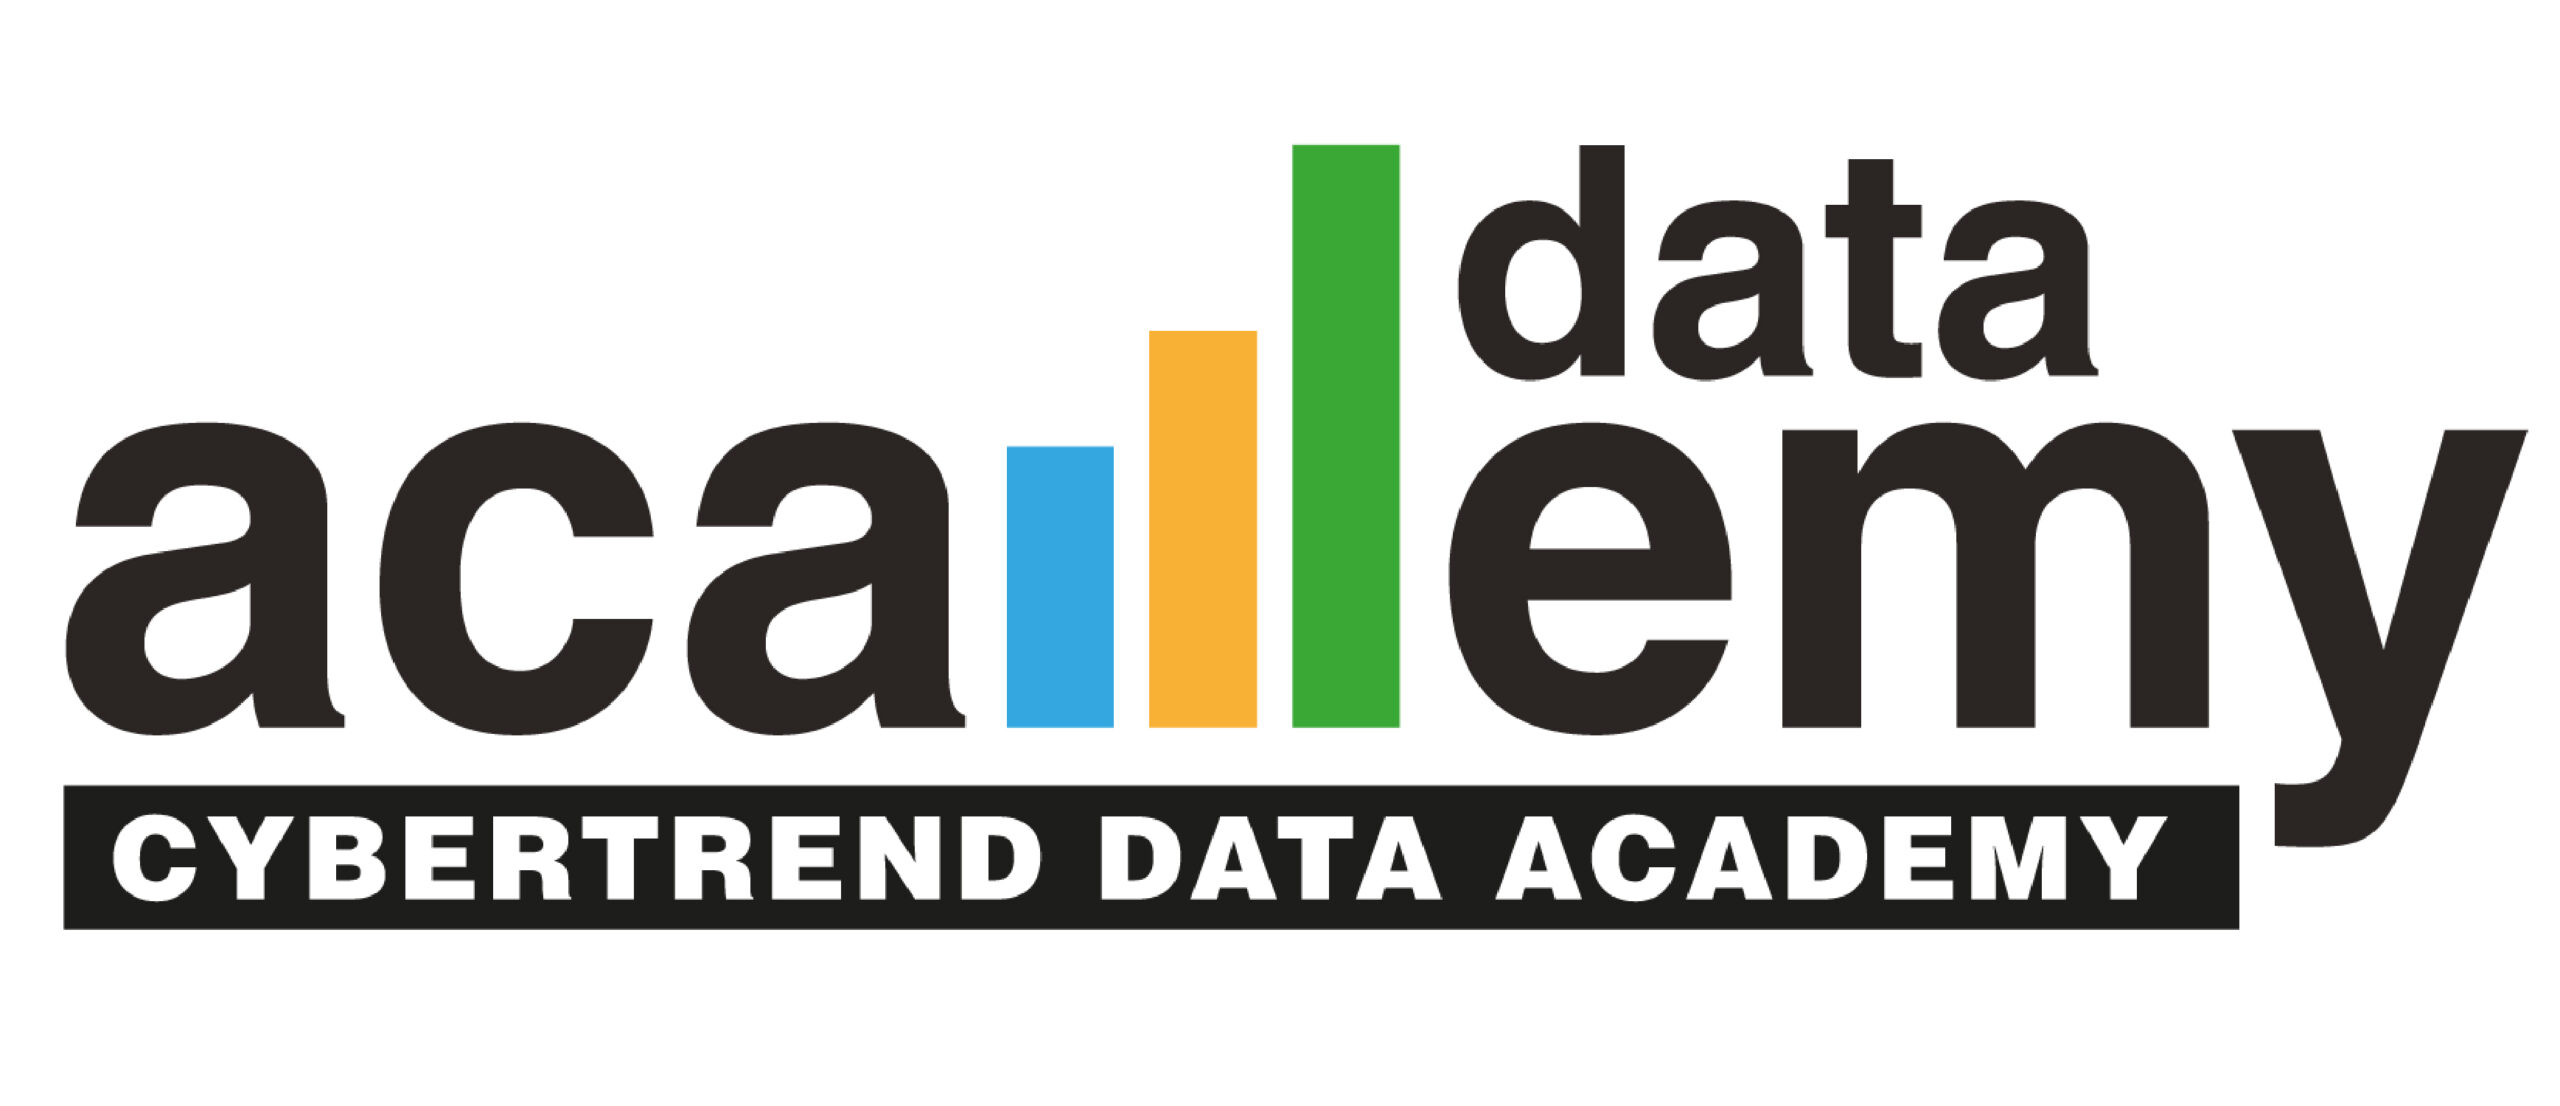 Cybertrend Data Academy